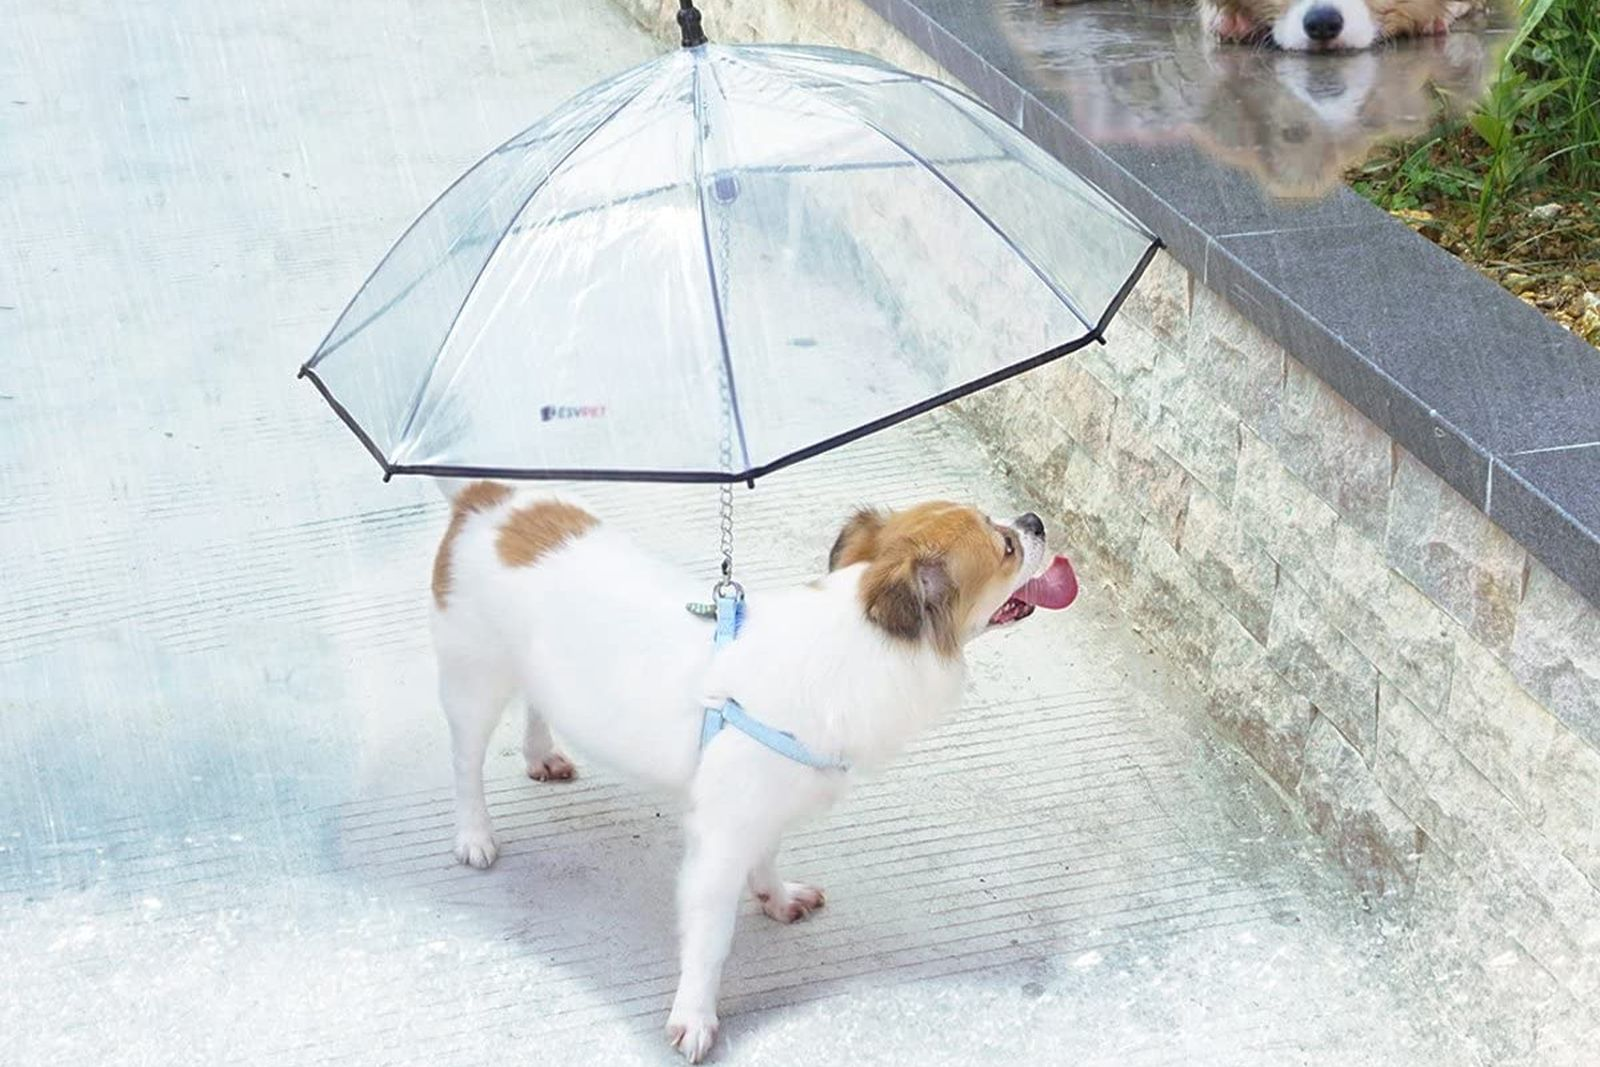 mejores paraguas para perros